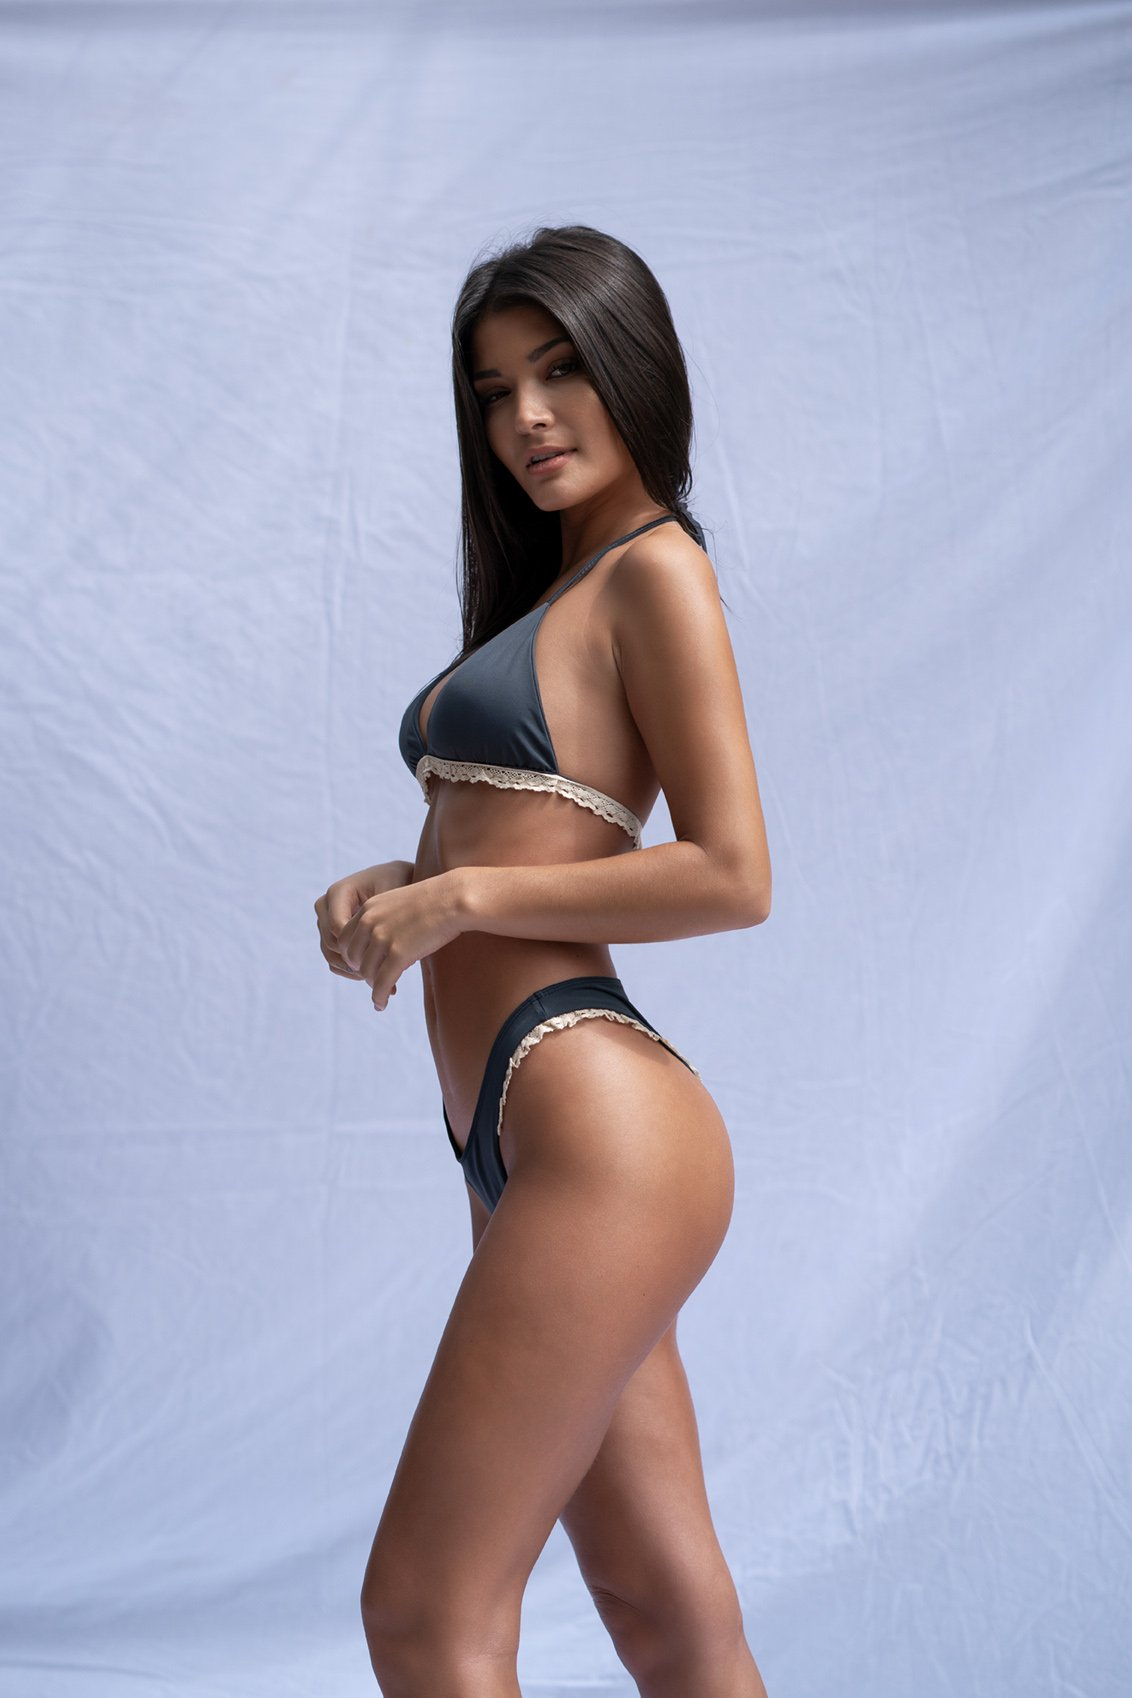 MOON NIGHT bikini luna brands.